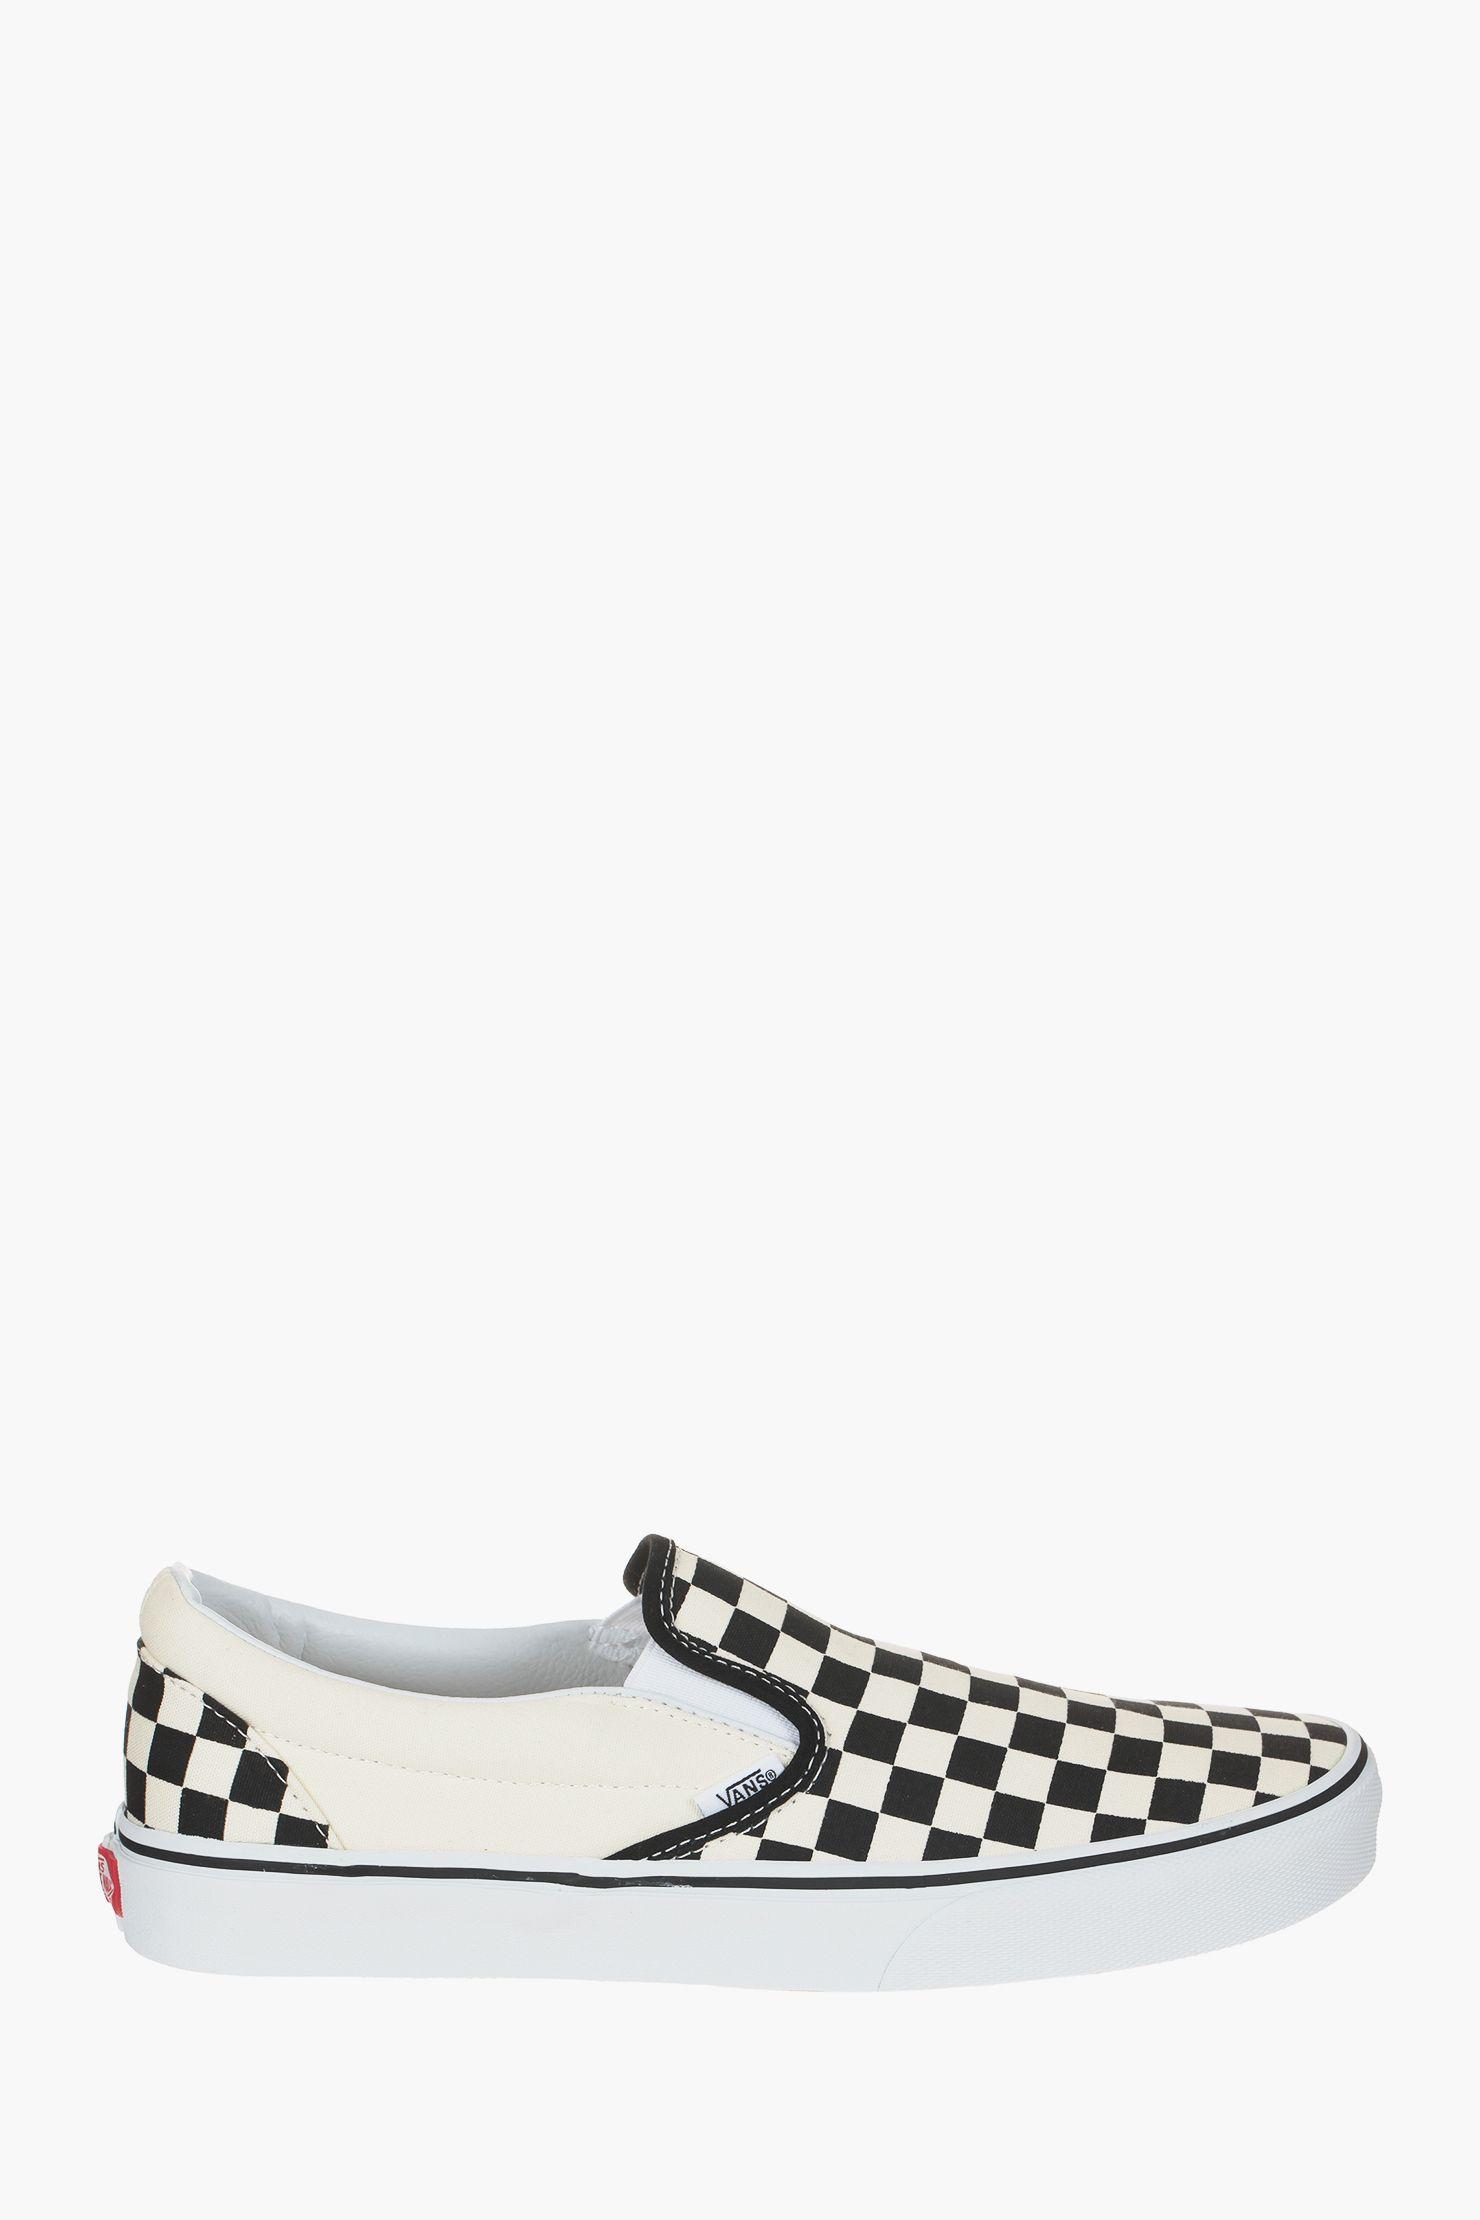 Slip-on imprimées damier Viane zoom | Chaussures en ligne ...